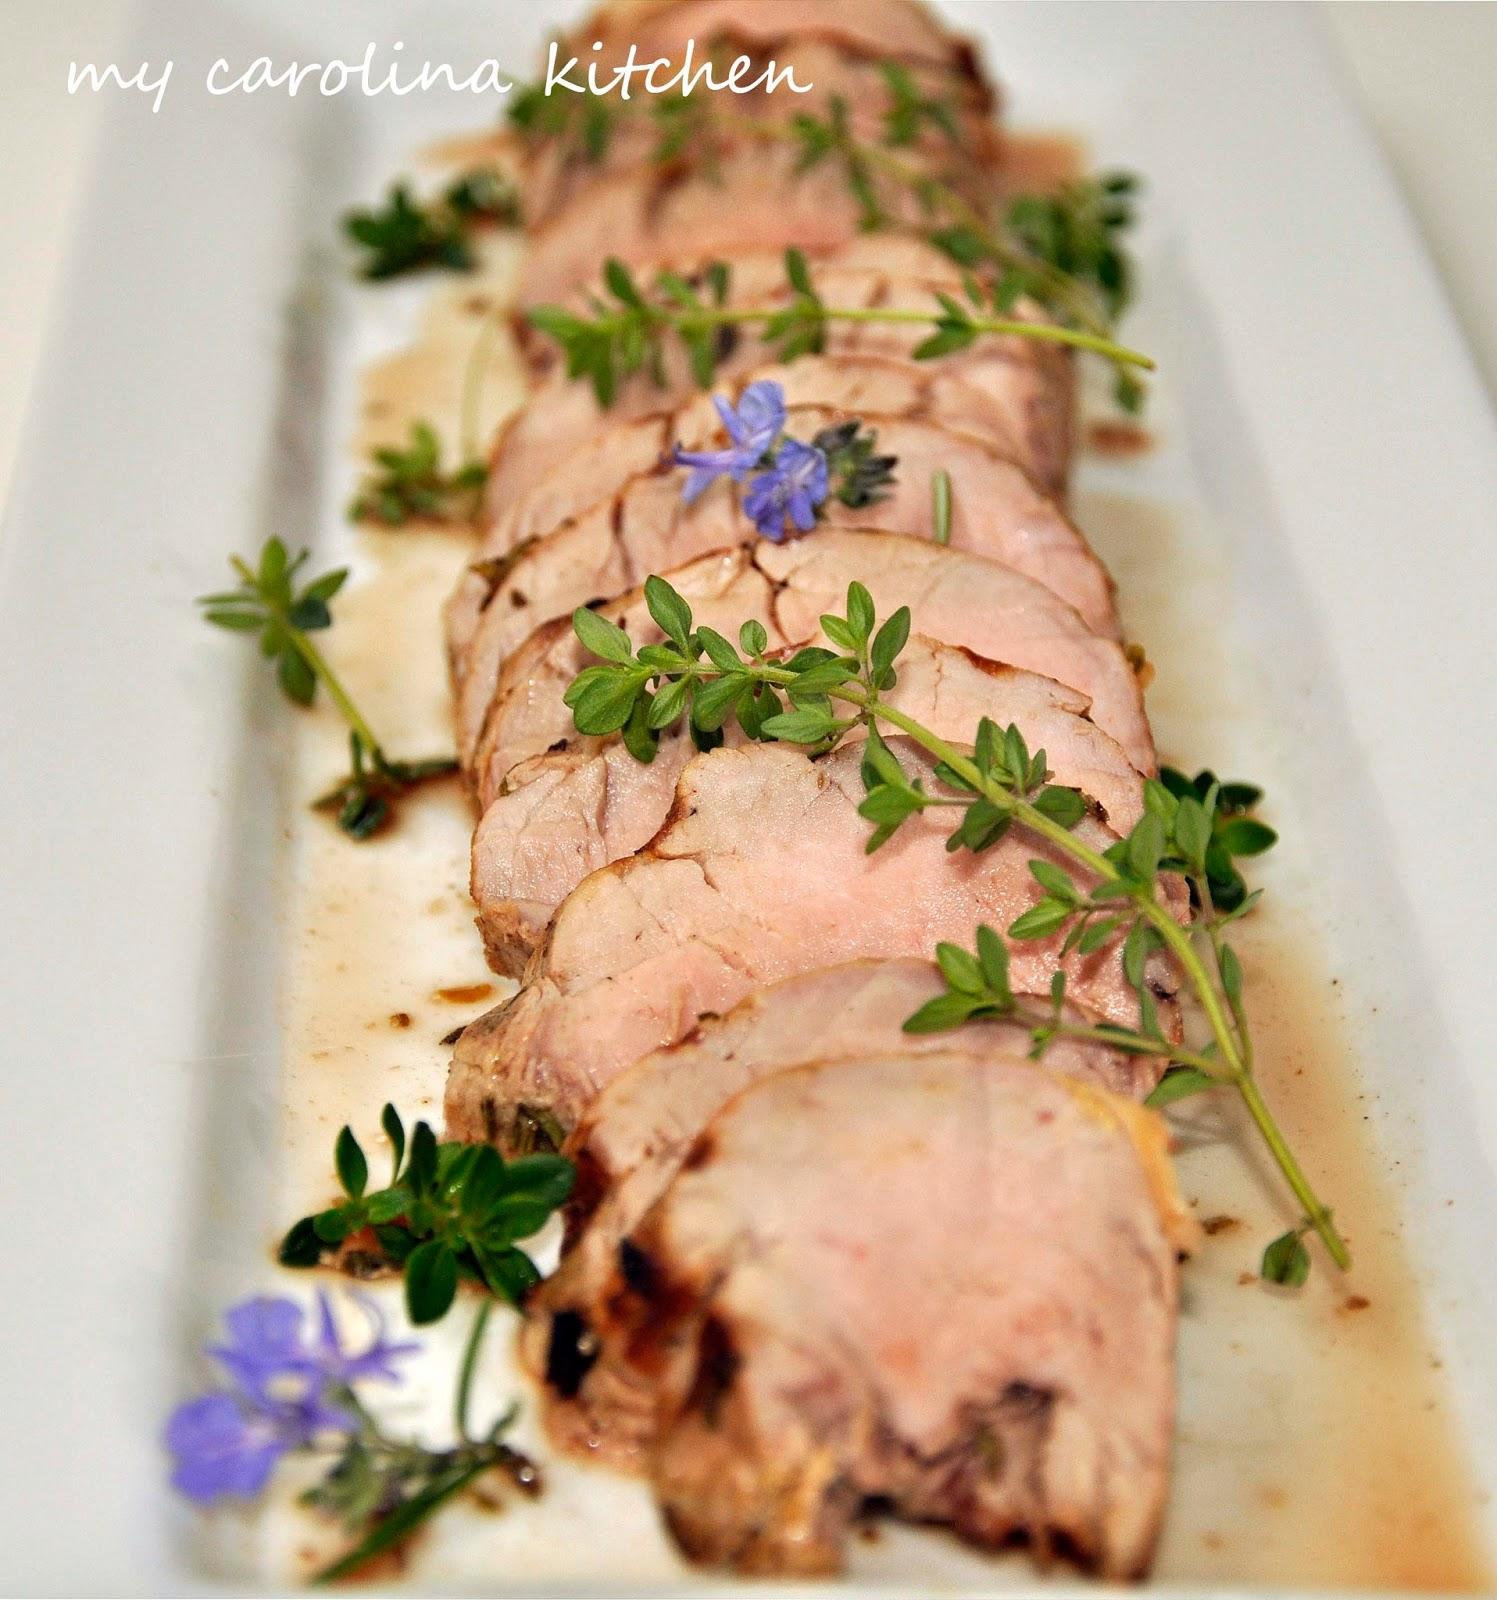 Greek Panzanella my carolina kitchen: herb-marinated pork tenderloin with a greek